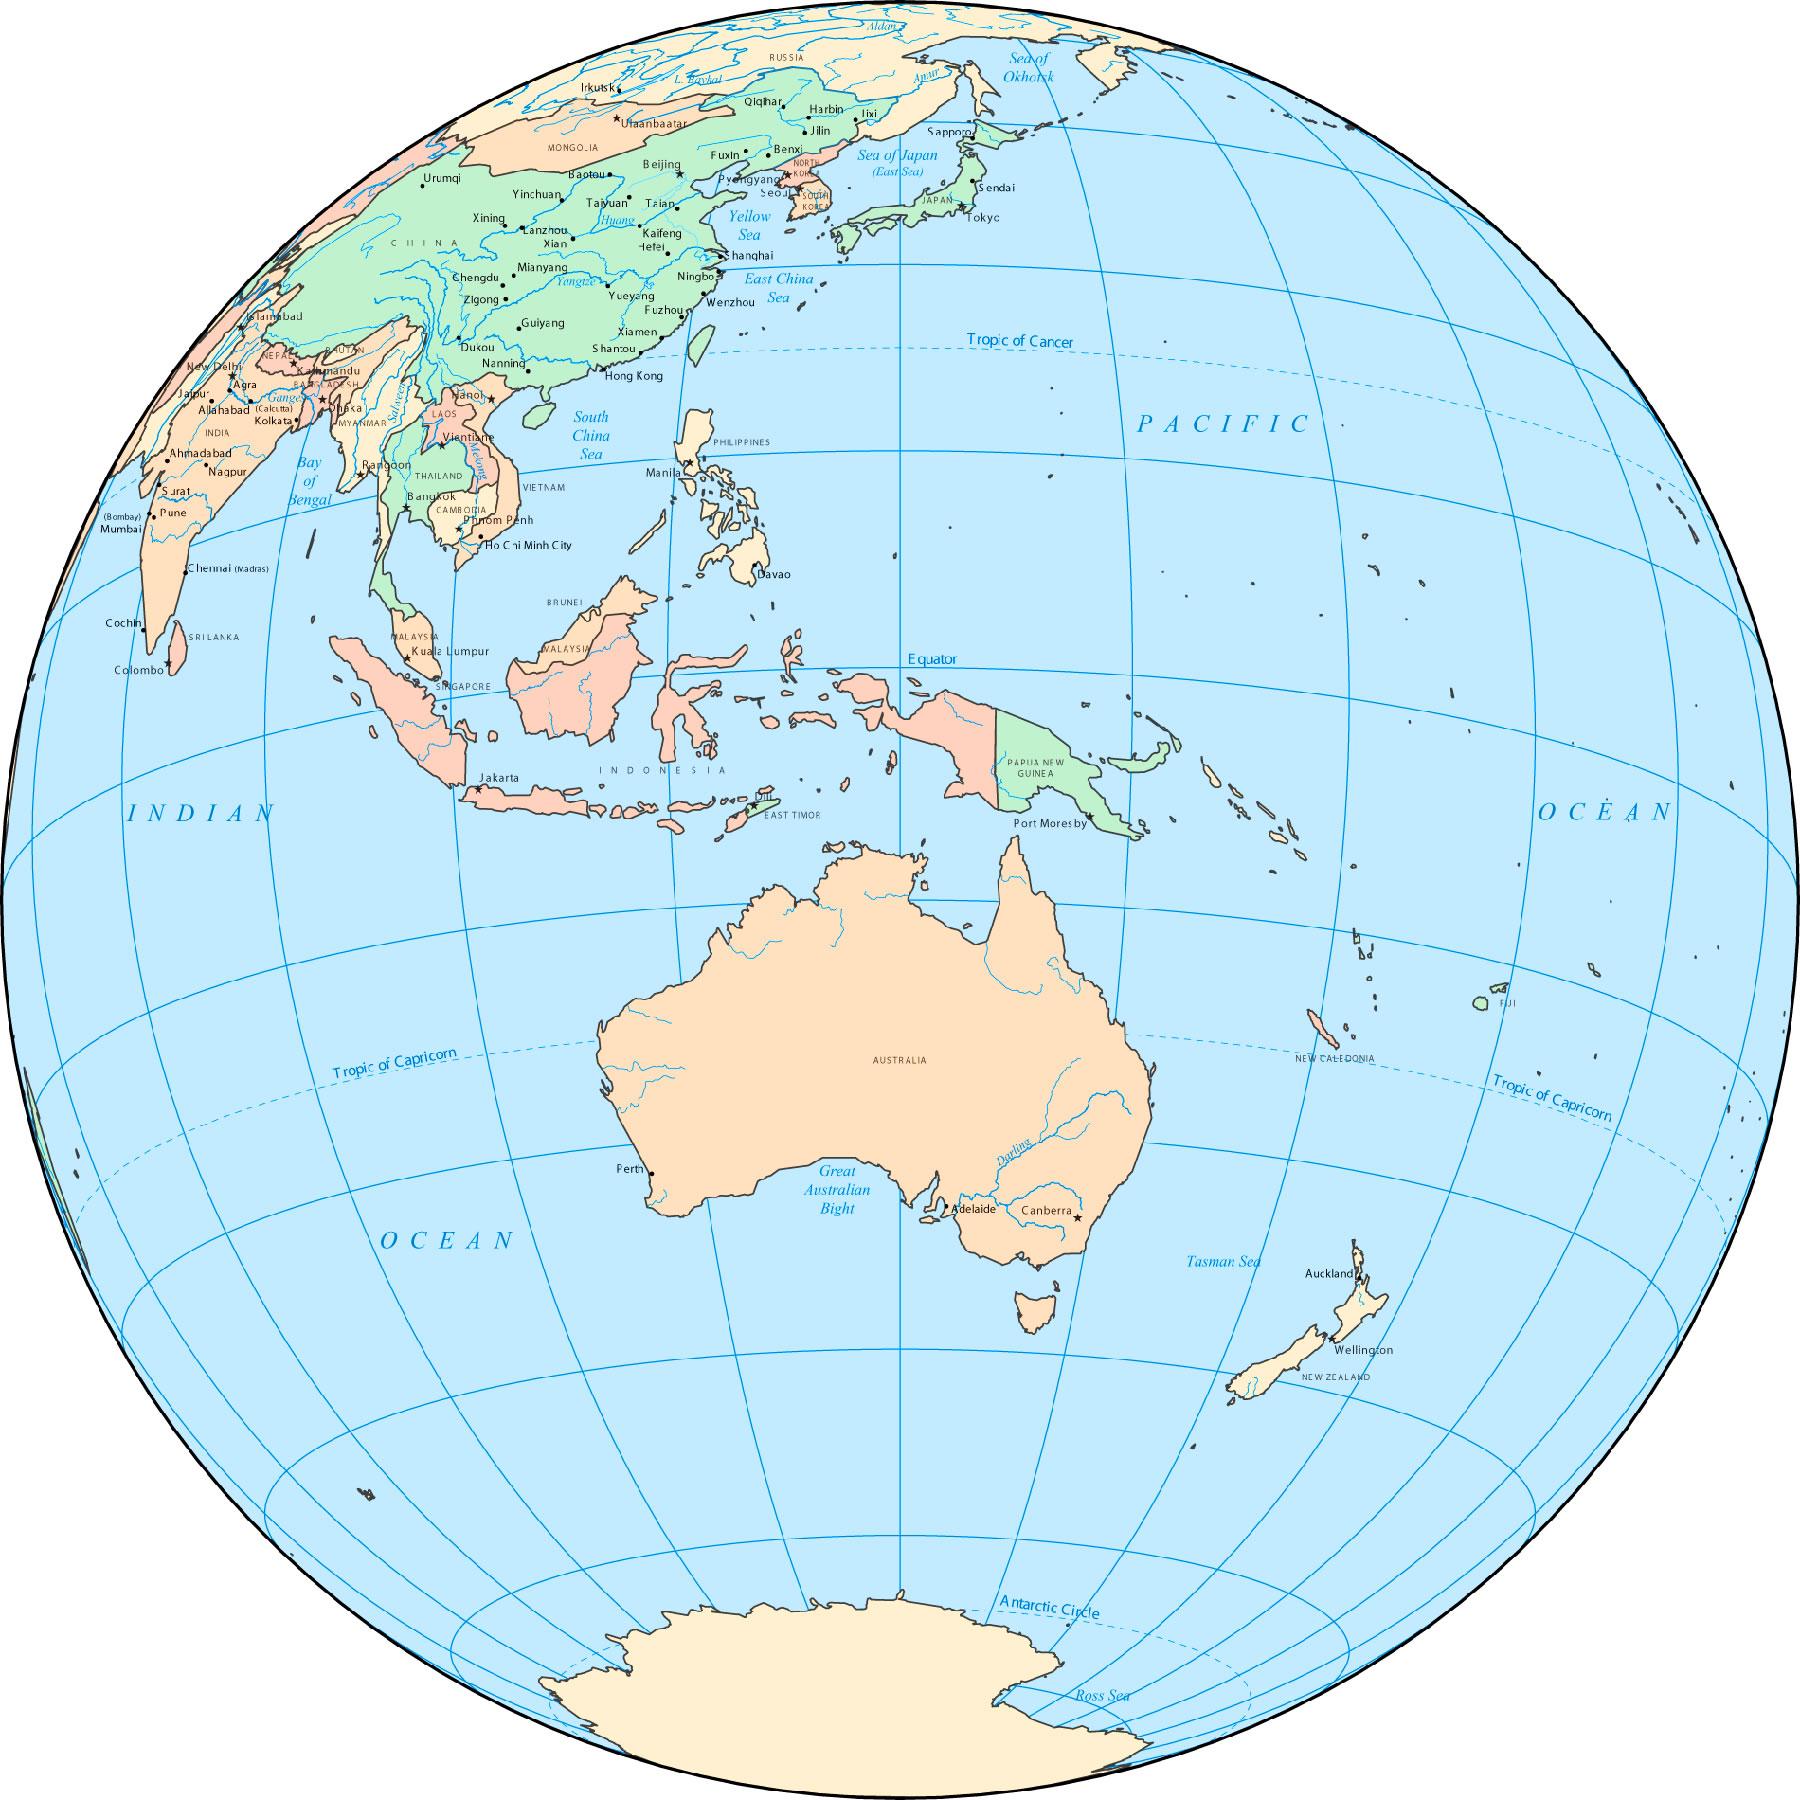 carte globe dessin australie carte du globe dessin de l 39 australie. Black Bedroom Furniture Sets. Home Design Ideas